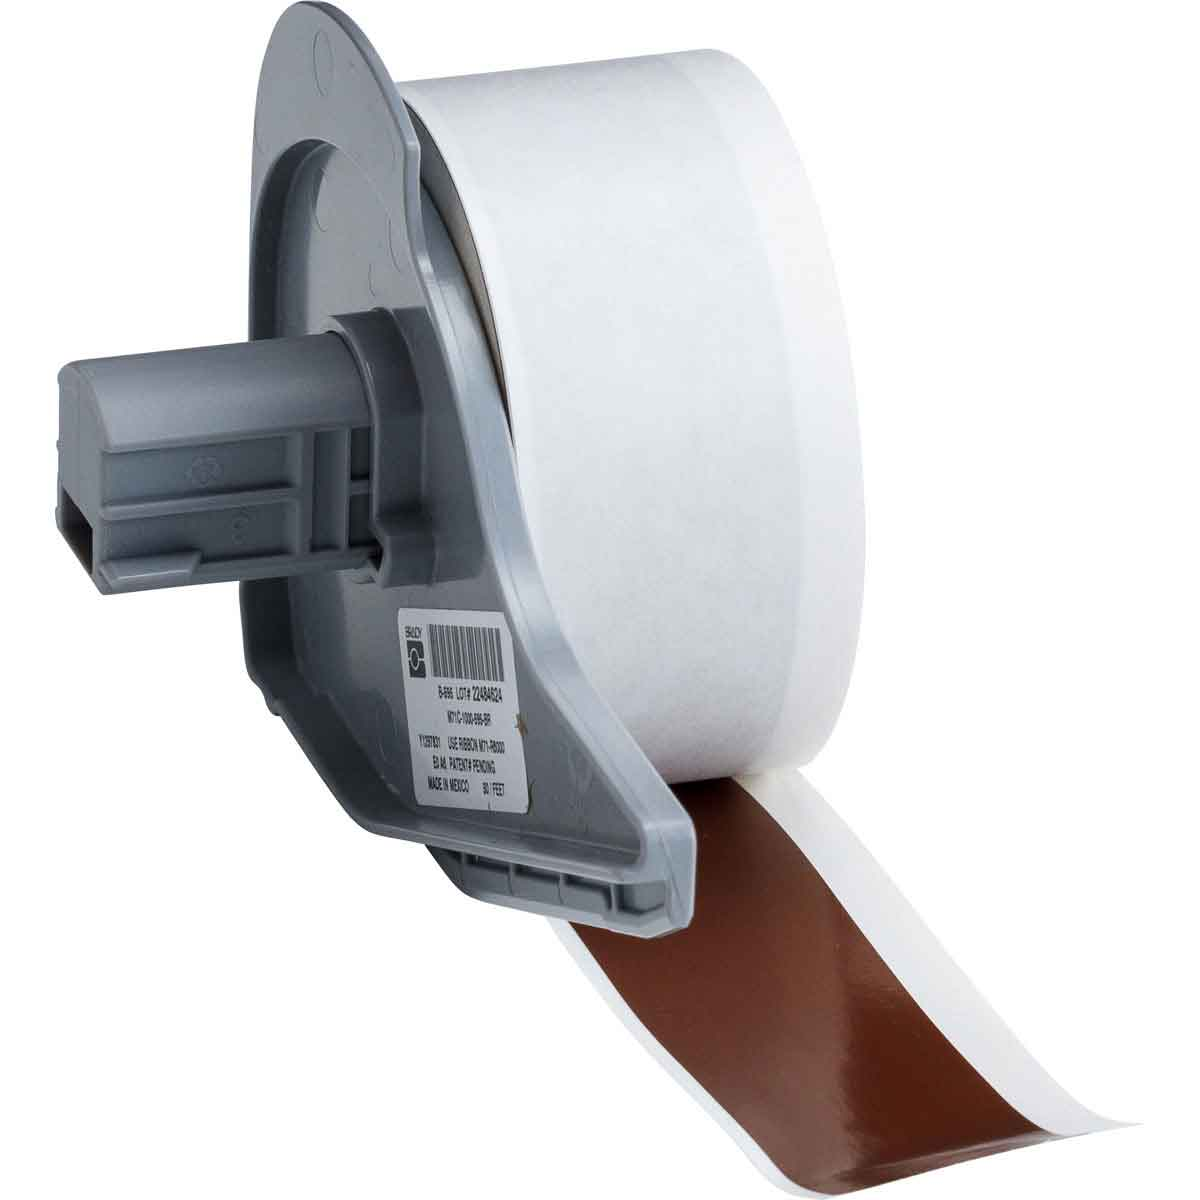 Brady® M71C-1000-595-BR Blank Thermal Transfer Tape, 50 ft L x 1 in W, Brown, B-595 Vinyl, Permanent Acrylic Adhesive, -40 to 180 deg F